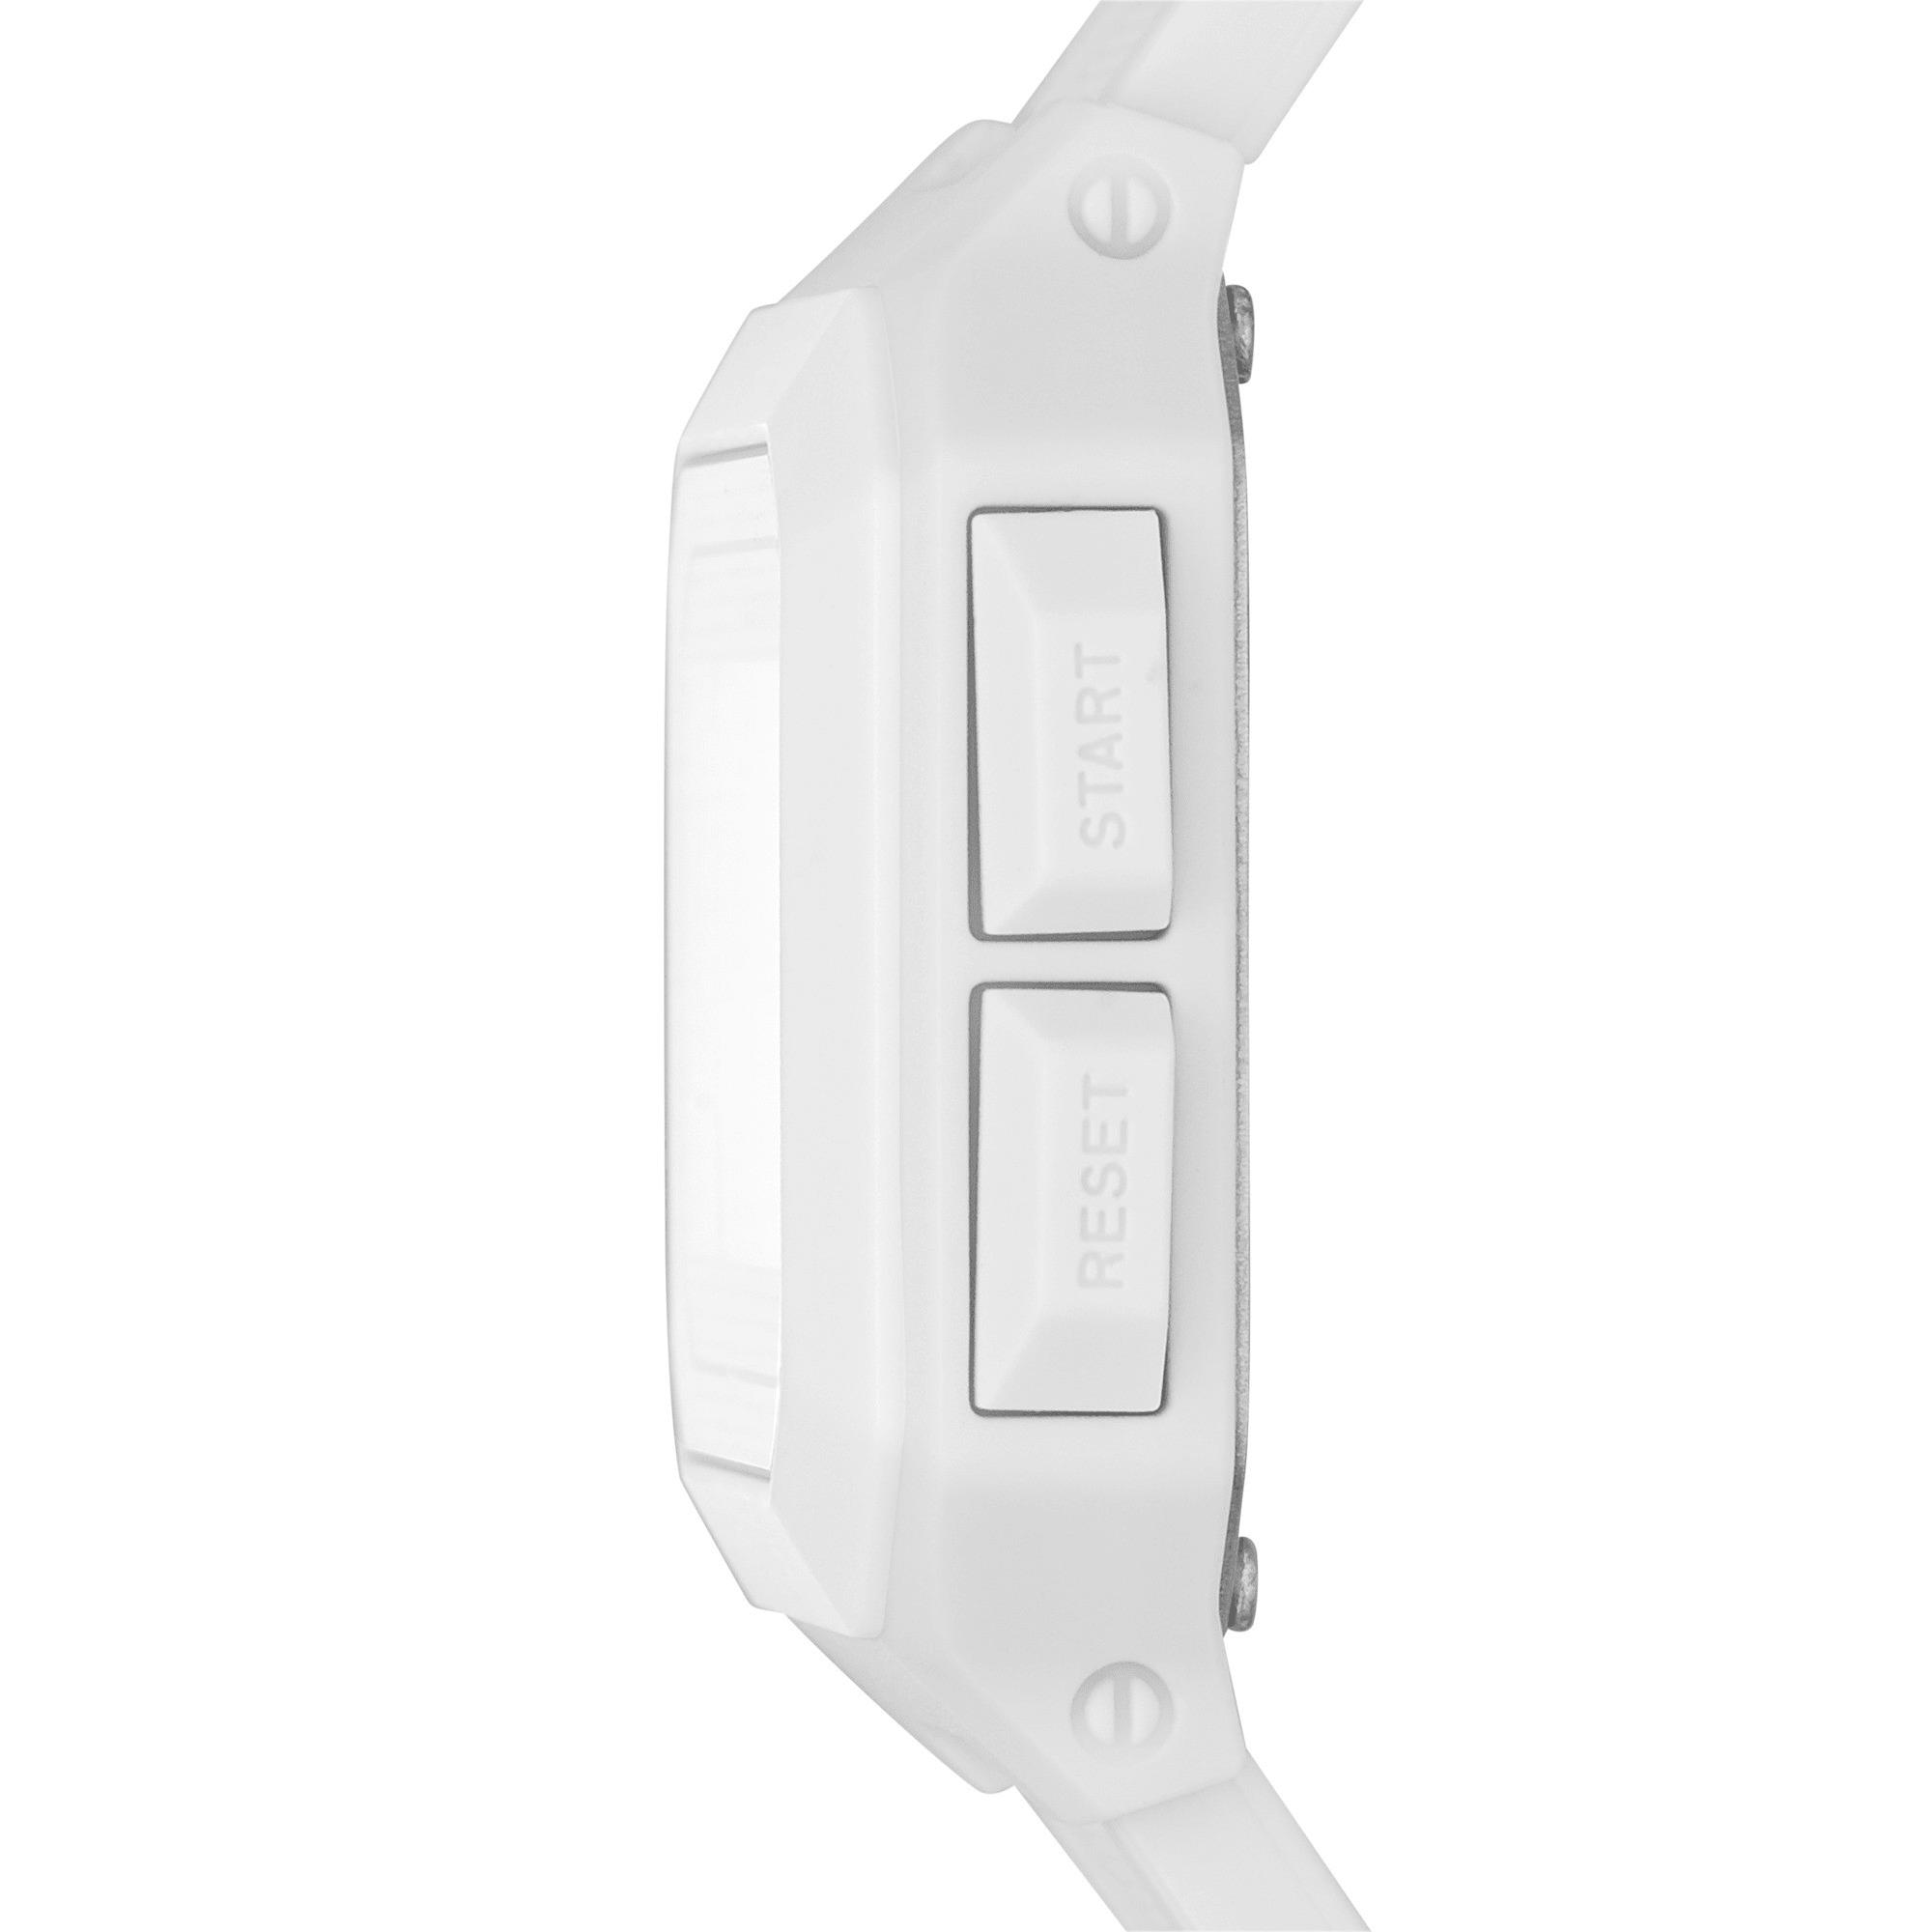 Thumbnail 3 of Remix White Digital Watch, White/White, medium